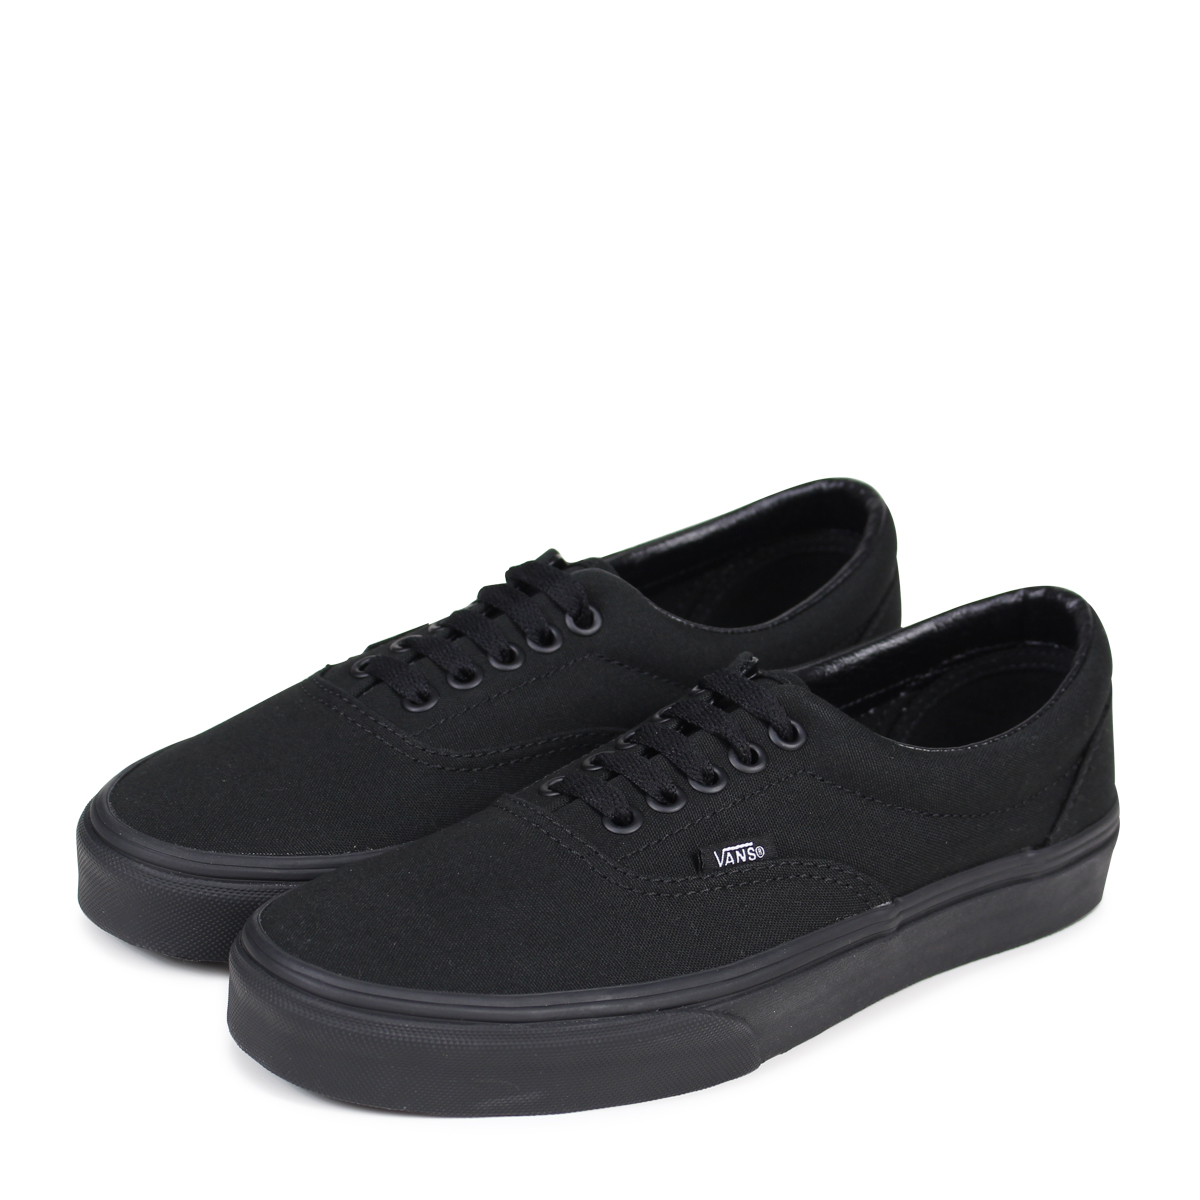 VANS ERA sneakers men gap Dis vans station wagons gills VN000QFKBKA black [reservation 226 additional arrival plan]